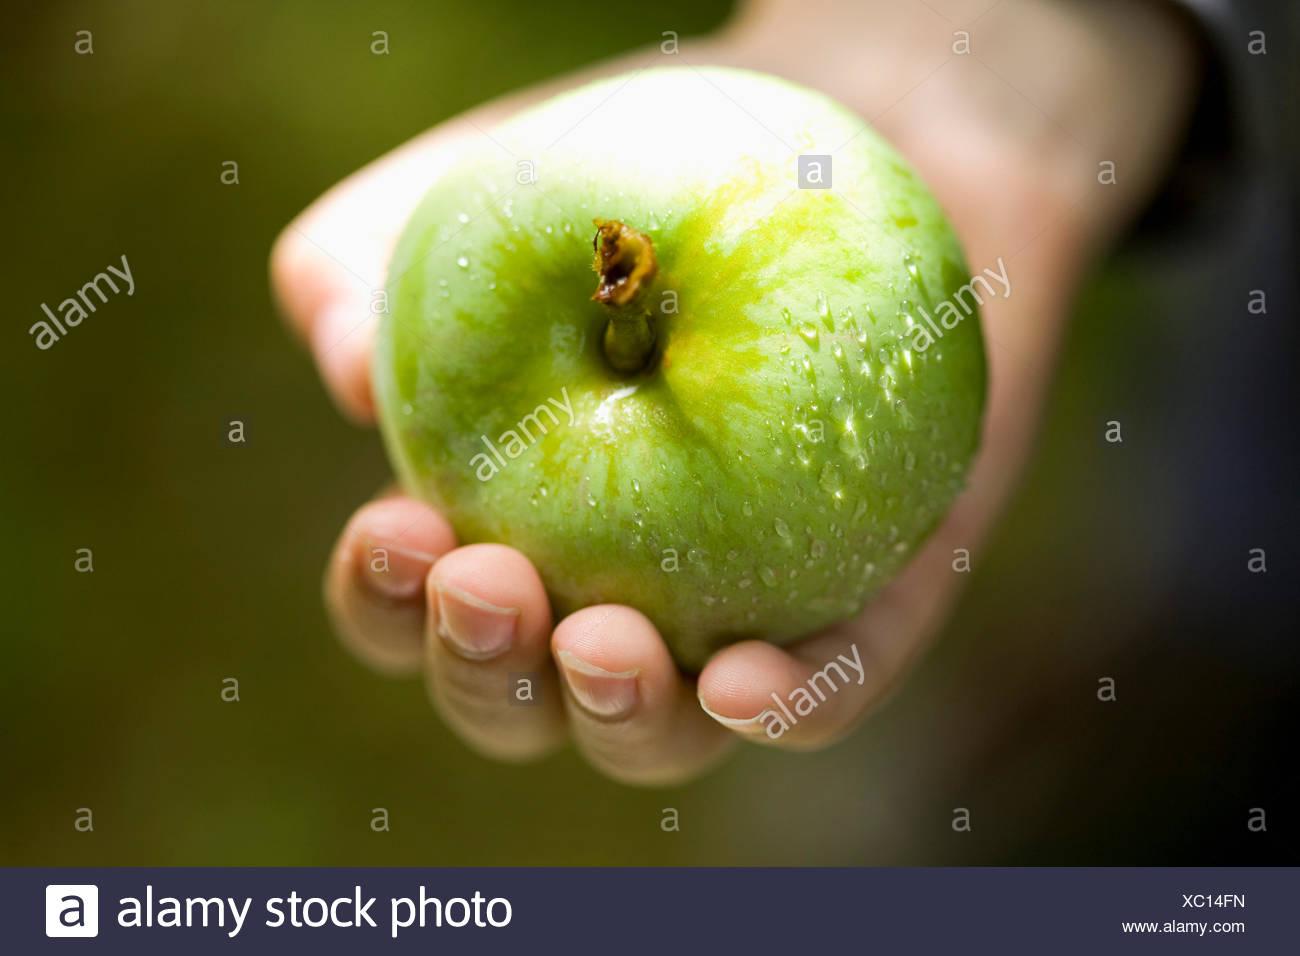 Mano sosteniendo manzana verde fresco Imagen De Stock